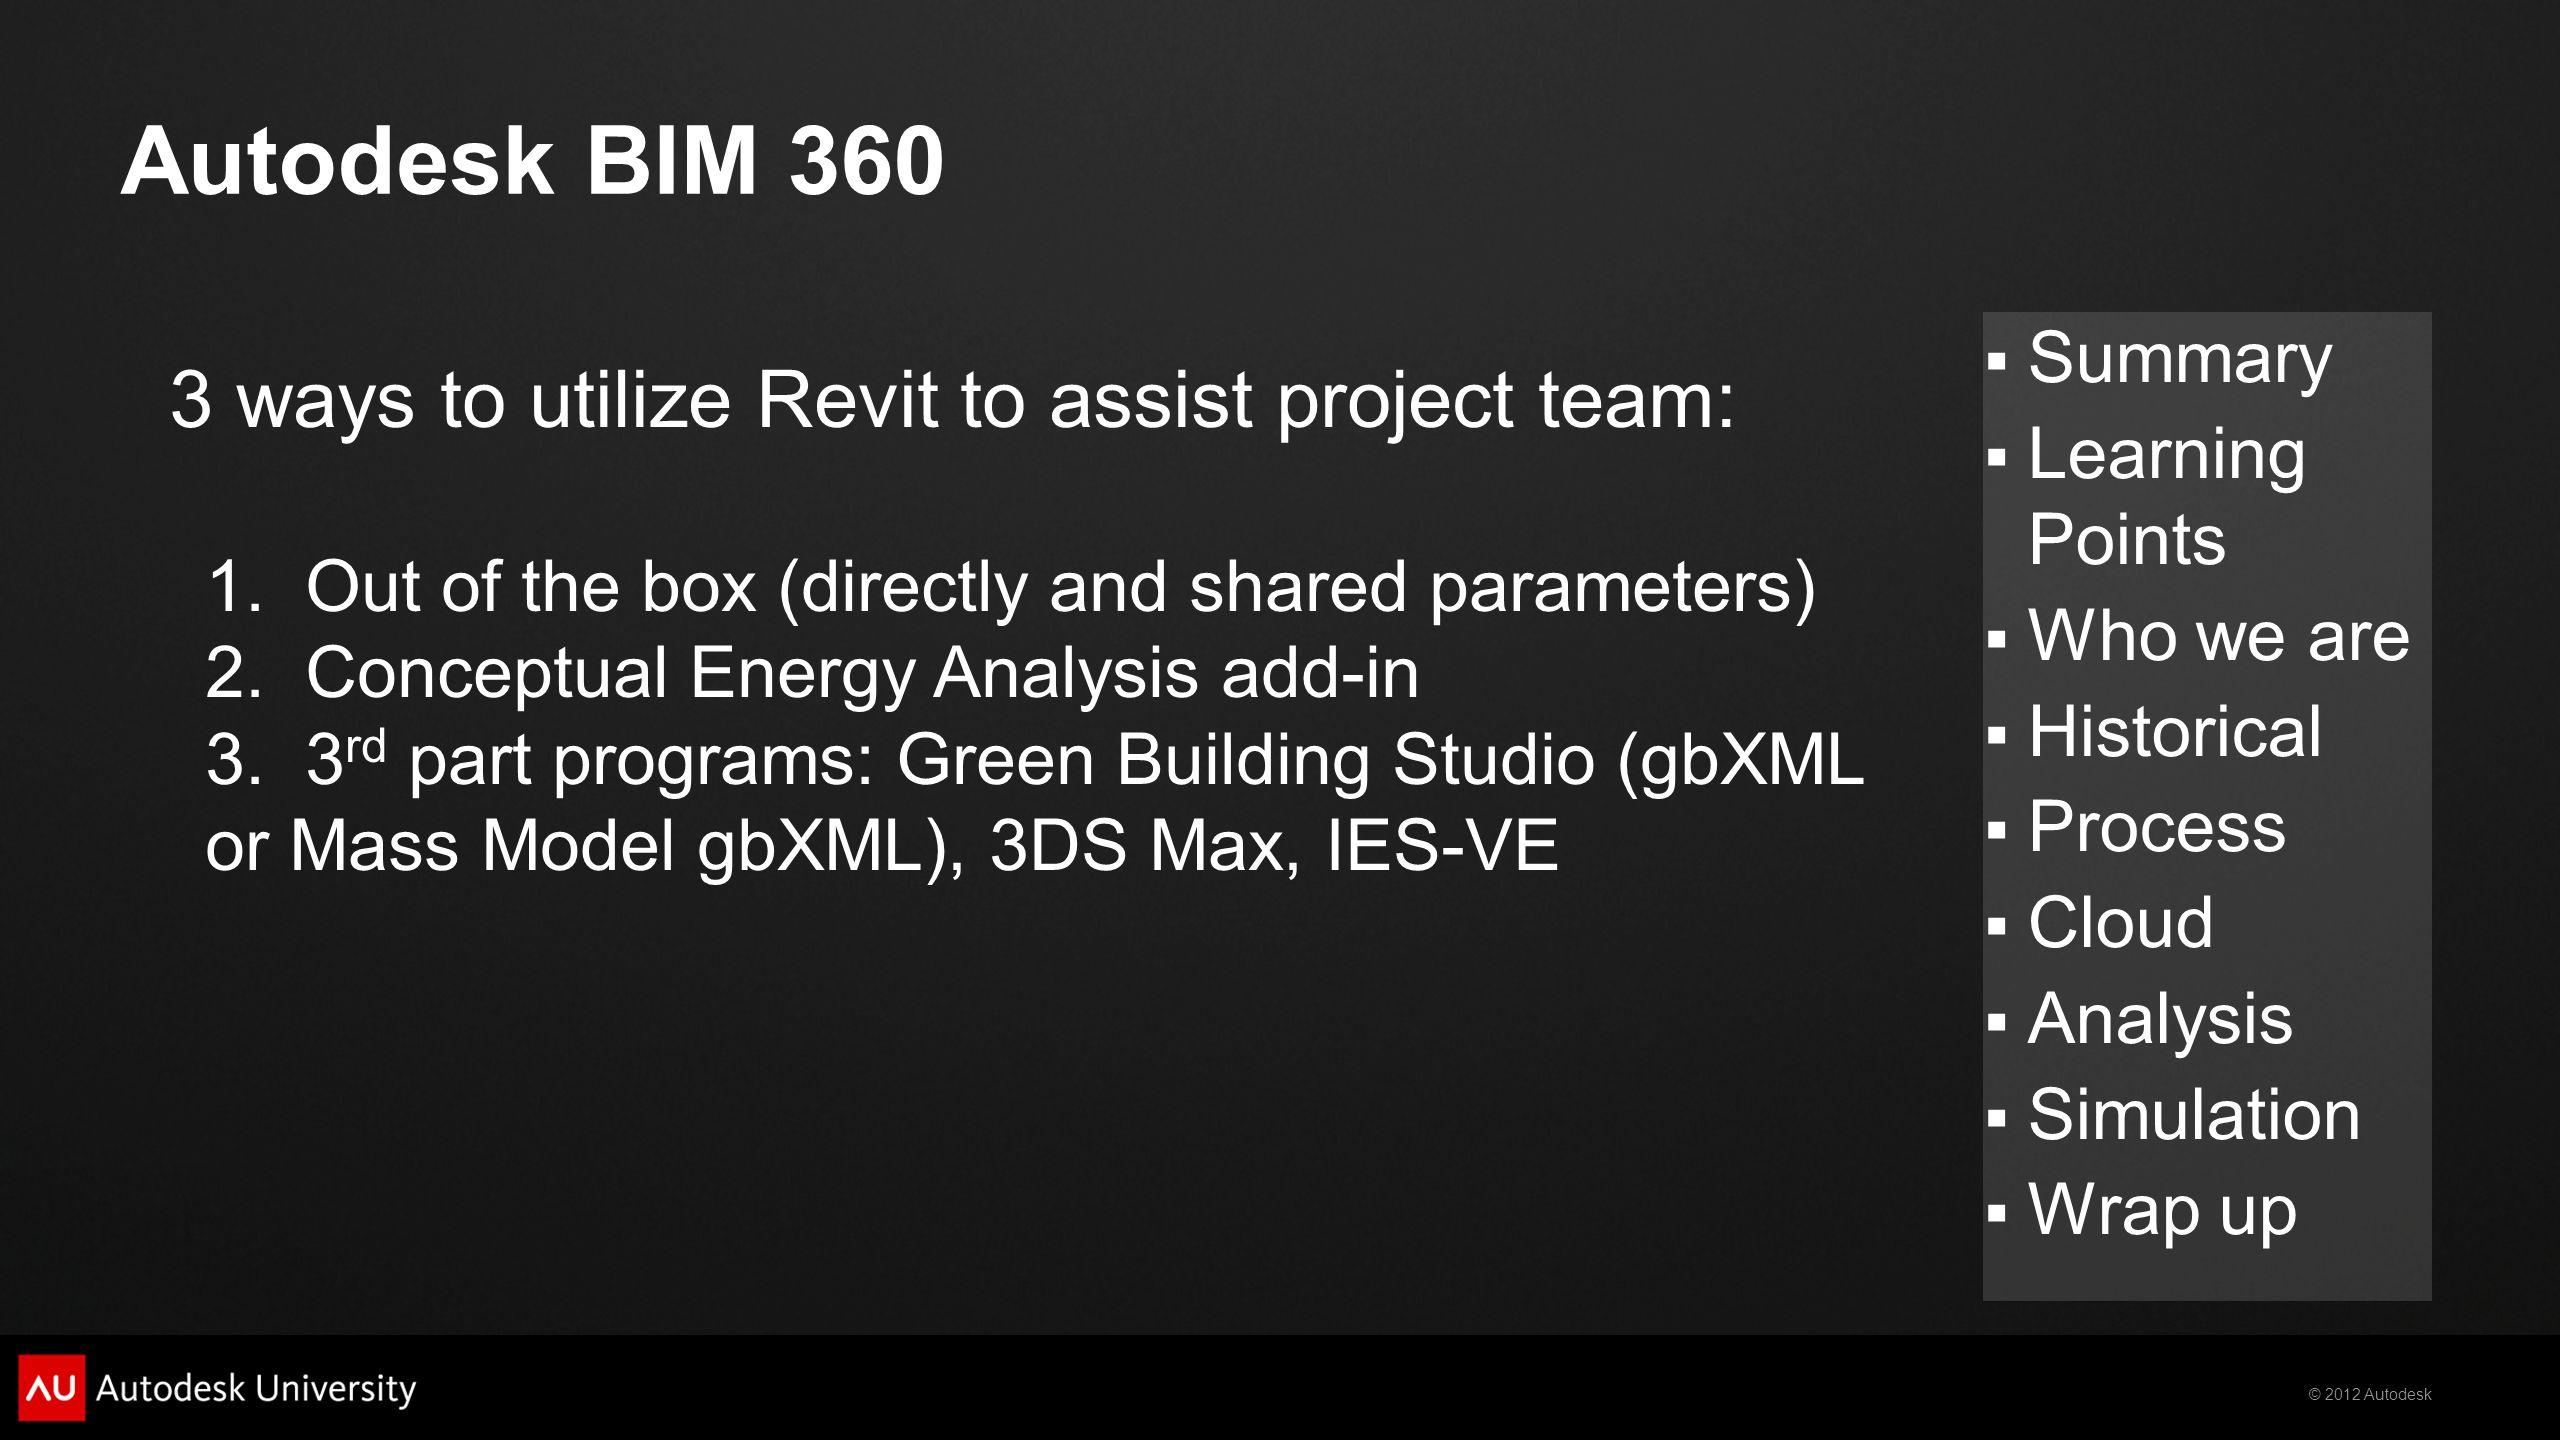 © 2012 Autodesk  Summary  Learning Points  Who we are  Historical  Process  Cloud  Analysis  Simulation  Wrap up Autodesk BIM 360 3 ways to u